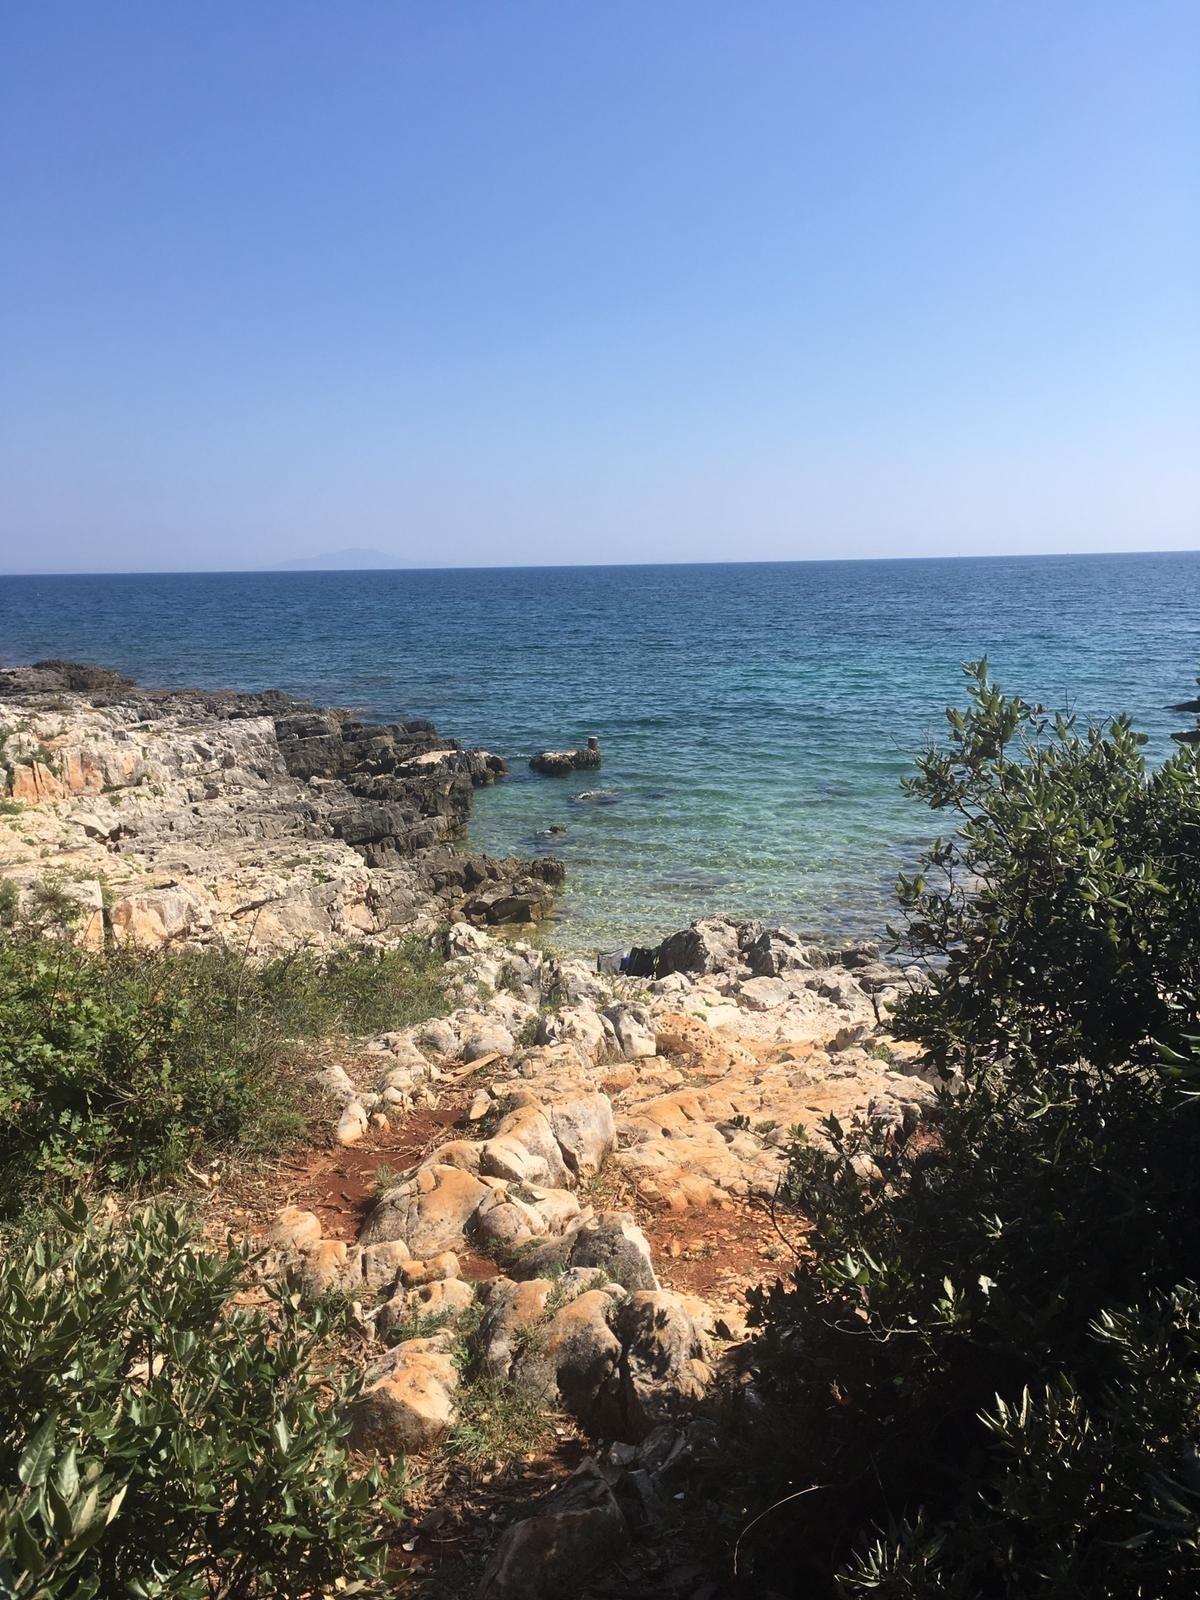 Liznjan, Istria County, Croatia